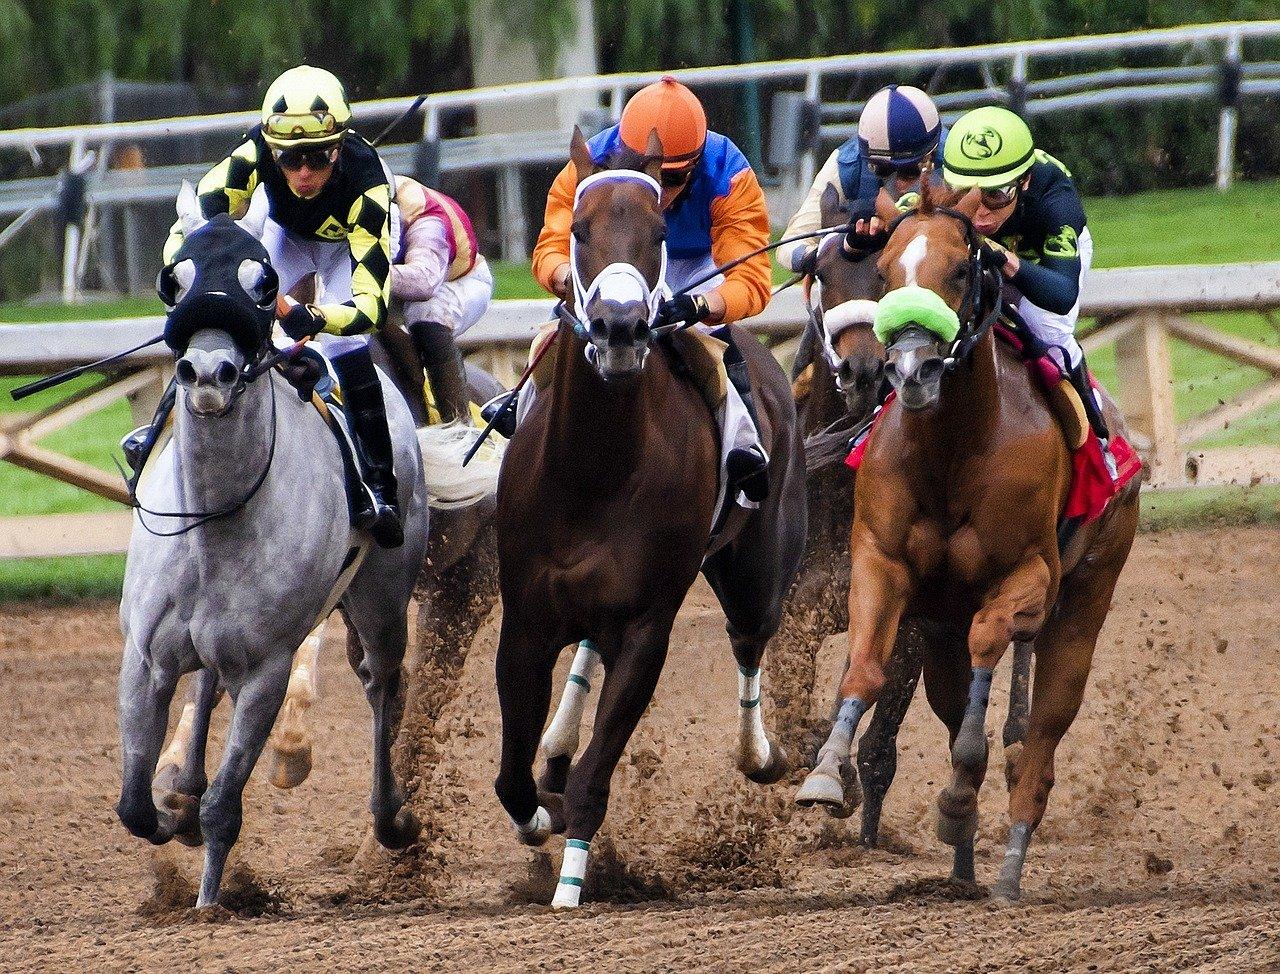 Kentucky Supreme Court limits slot-like horse racing games